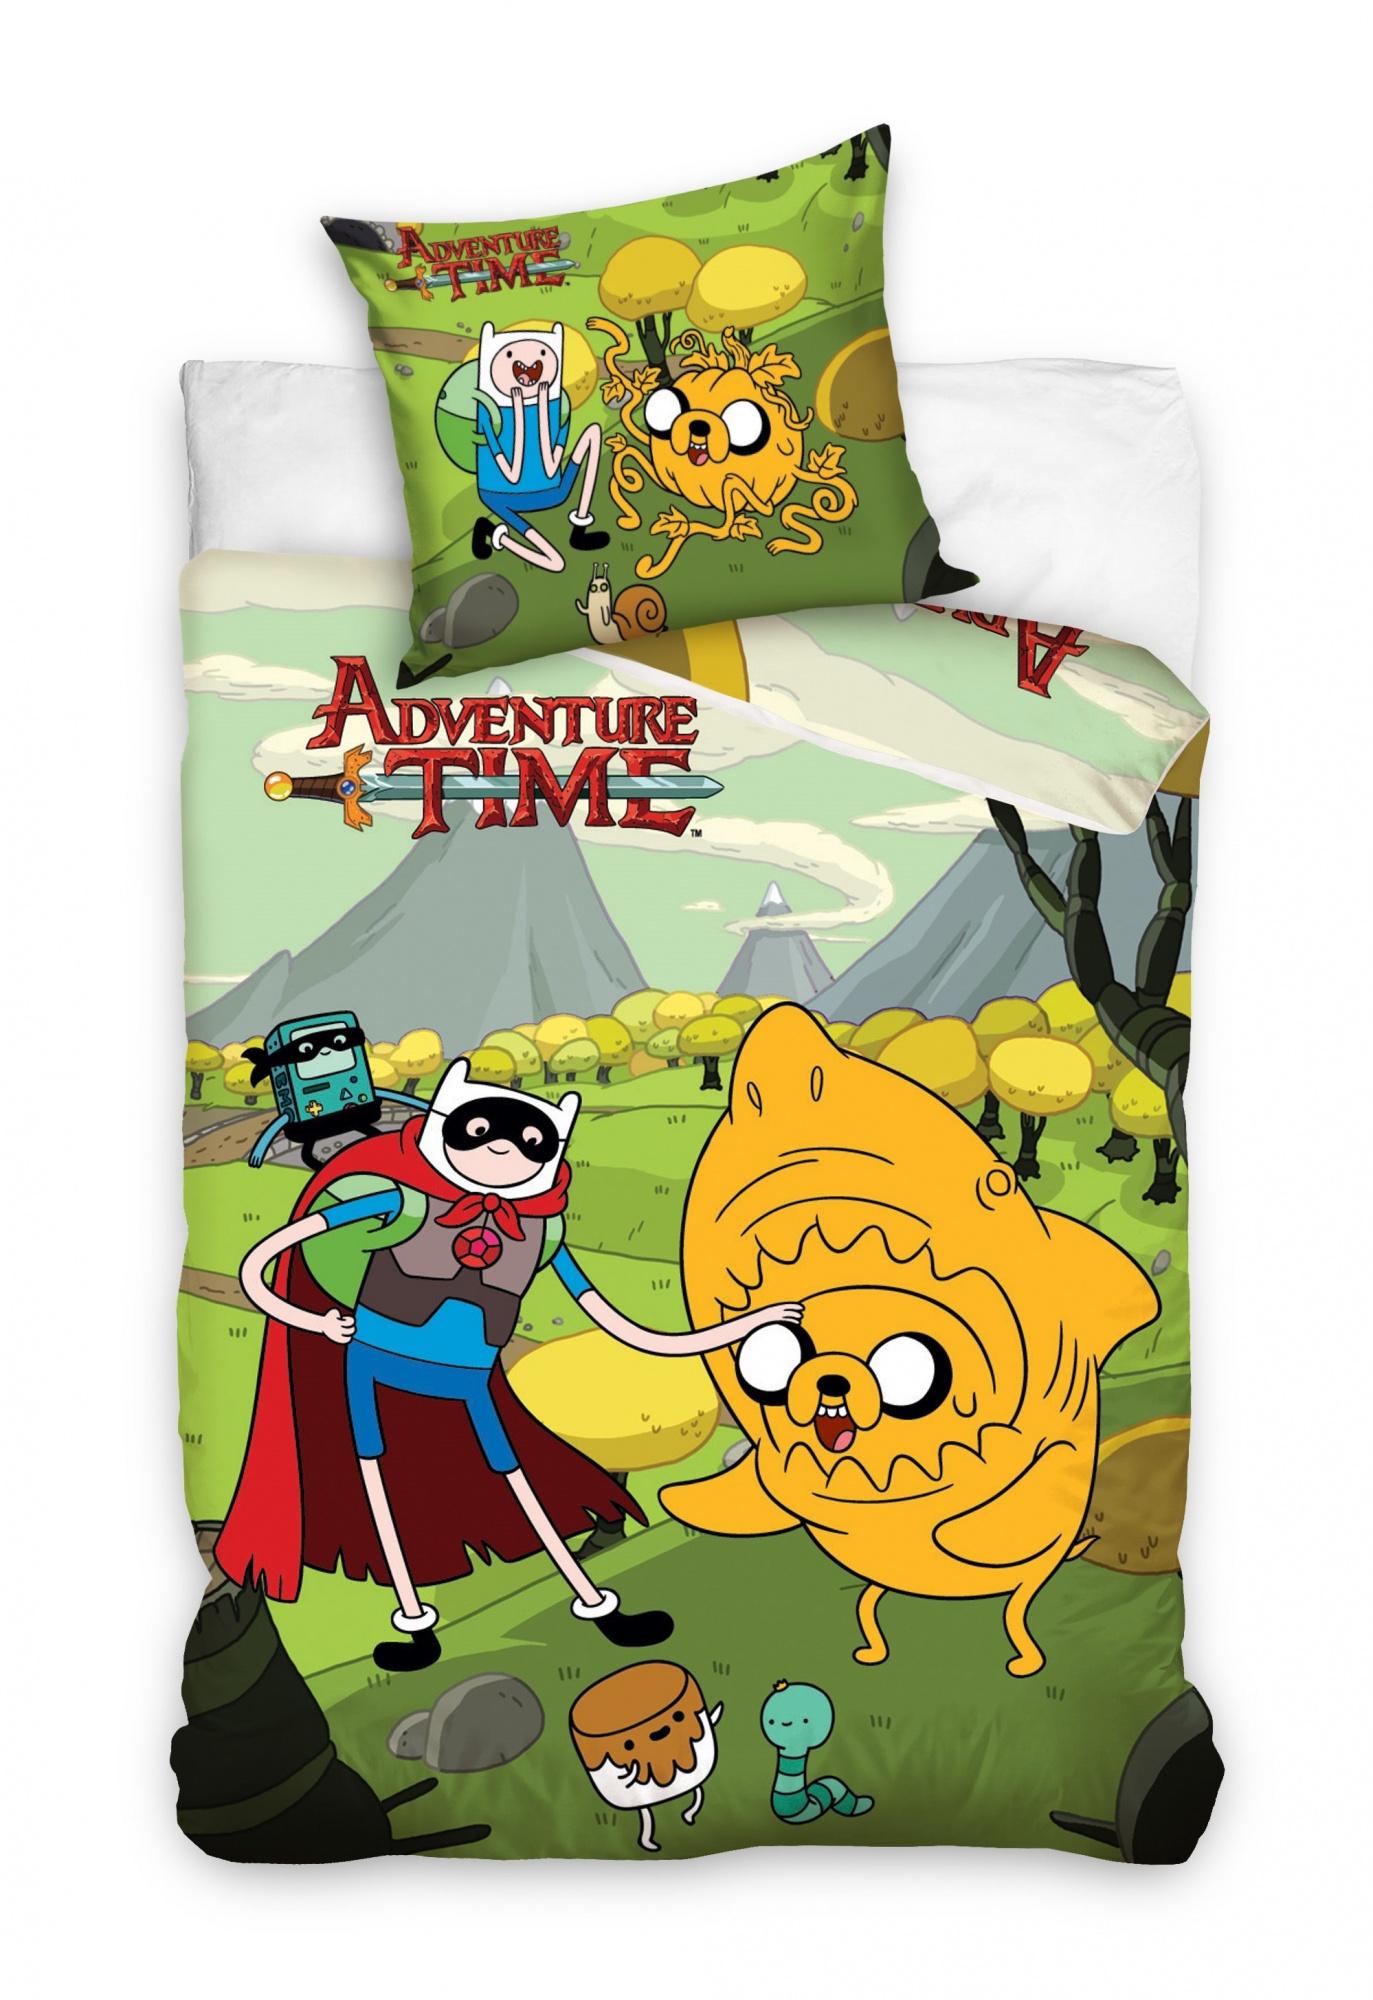 Carbotex Dekbedovertrek Adventure Time 1006 160 x 200 cm